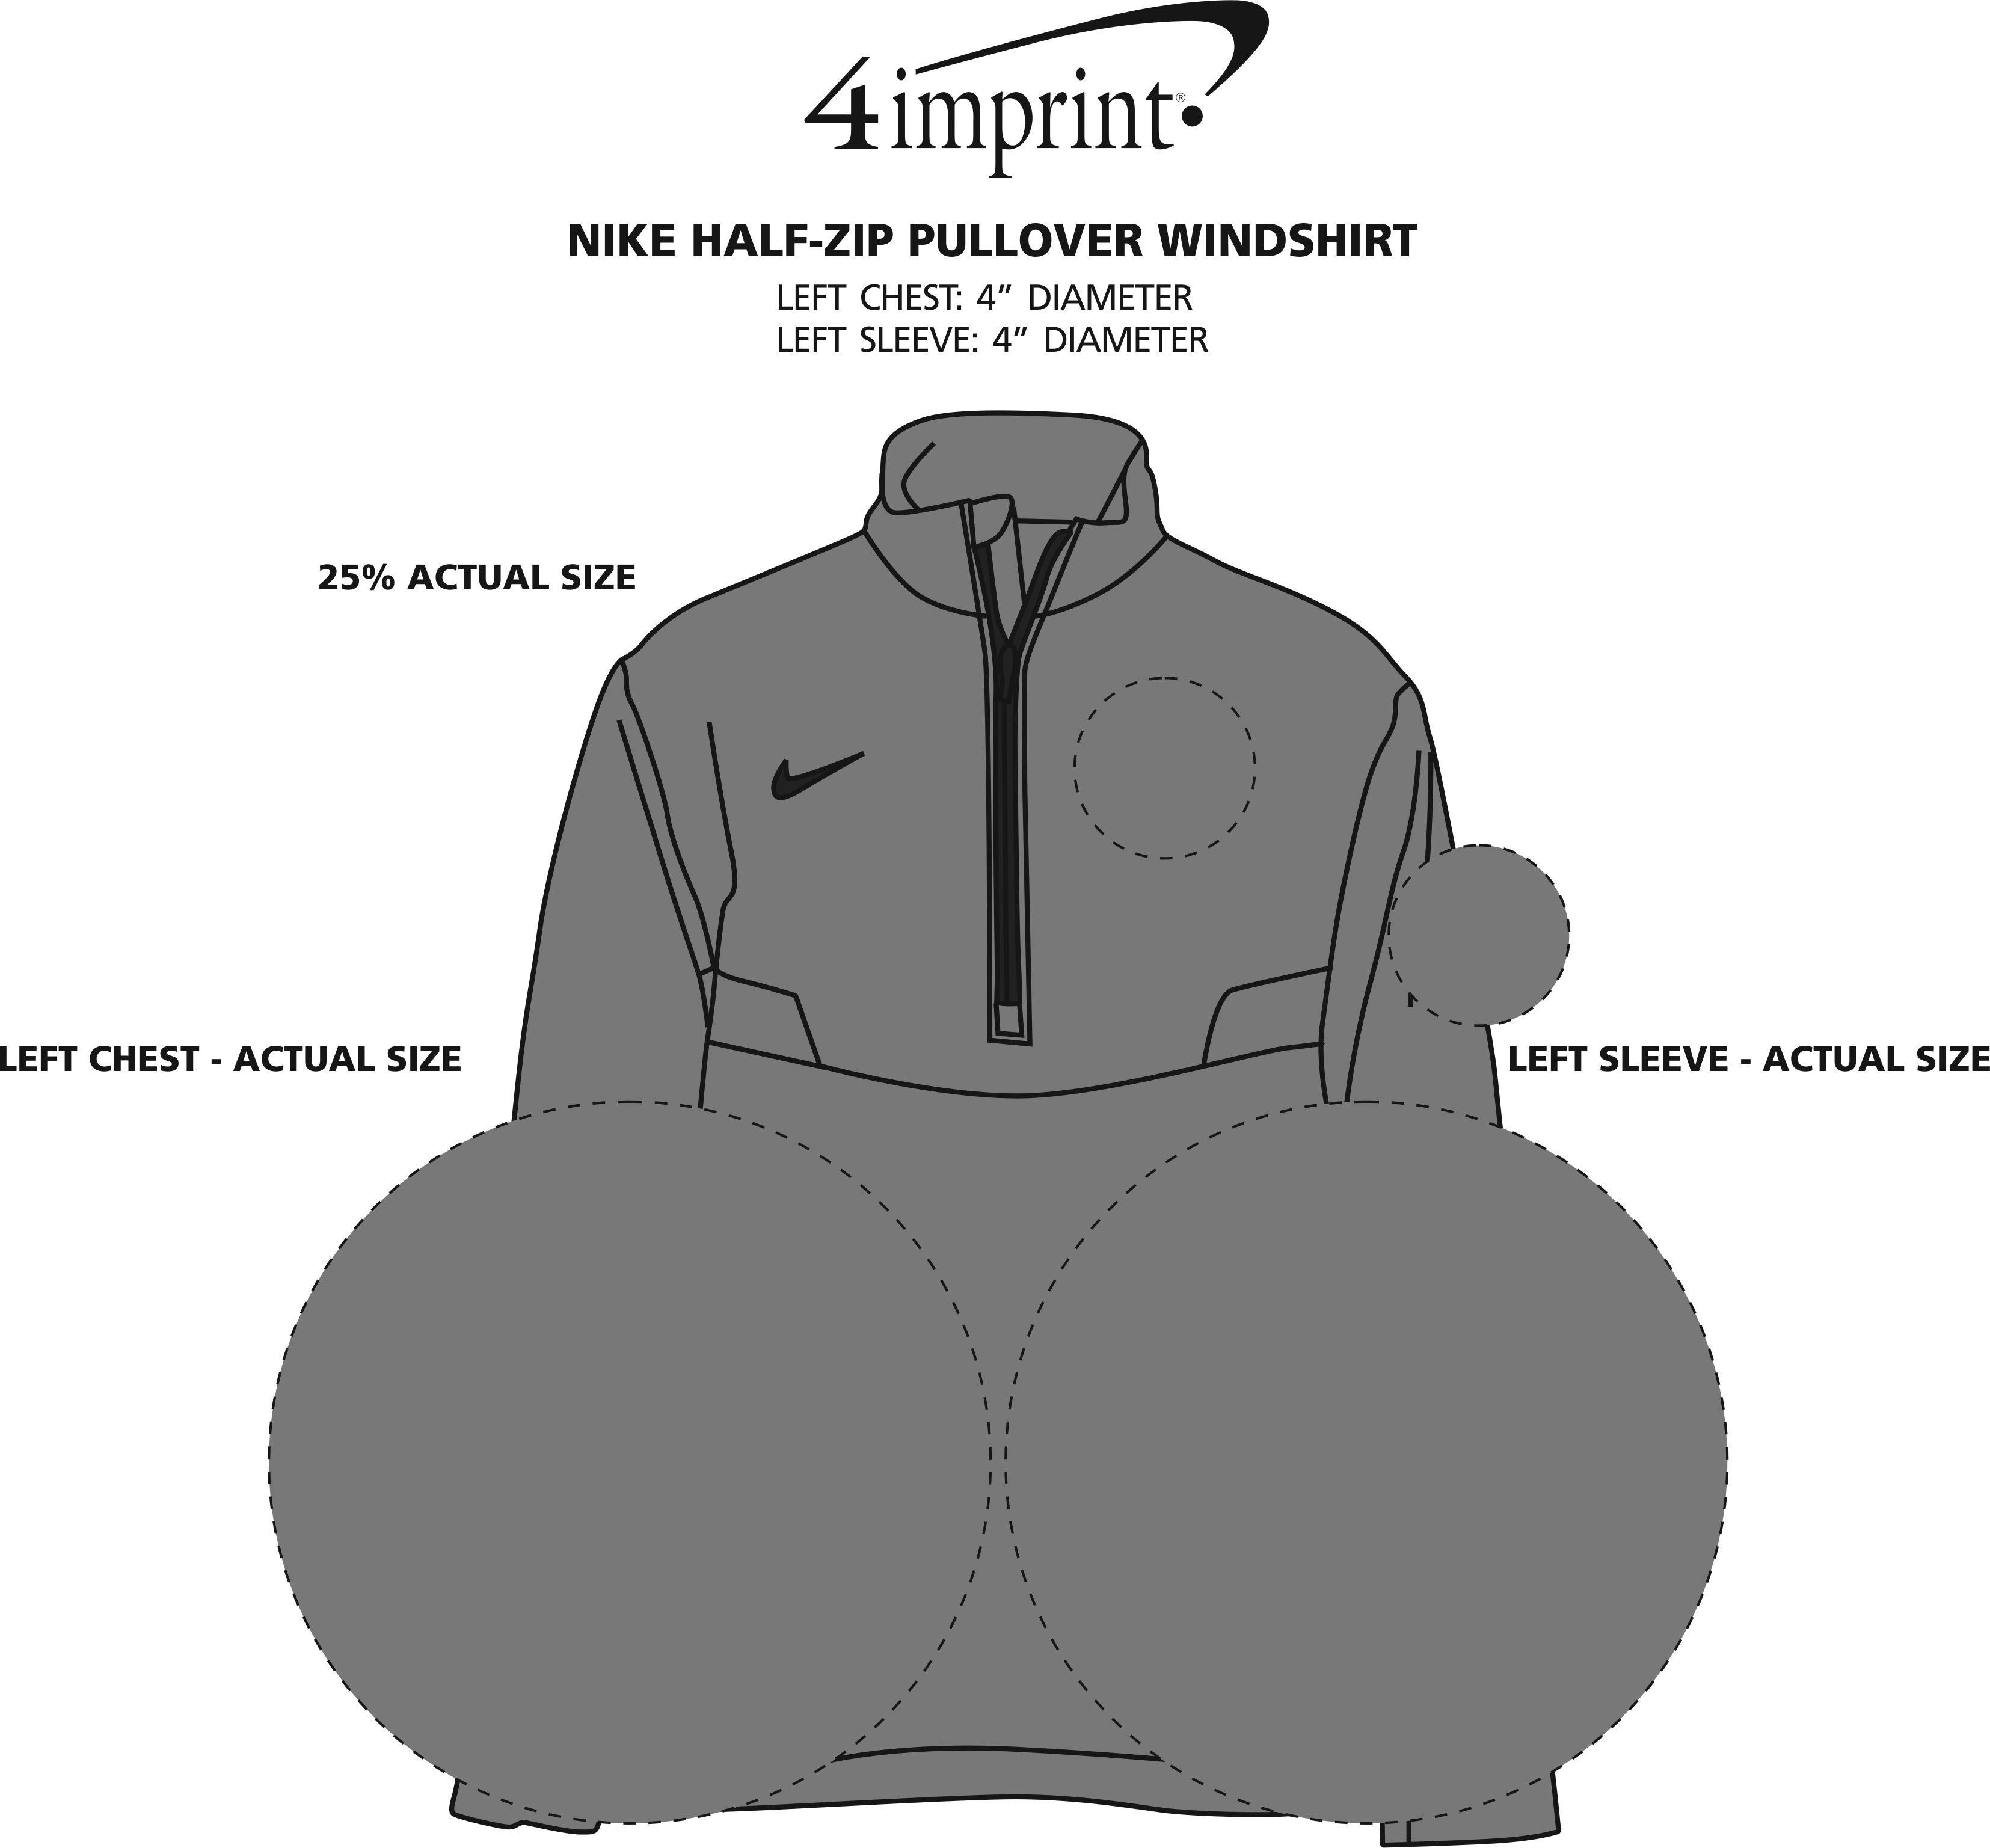 Imprint Area of Nike 1/2-Zip Pullover Windshirt